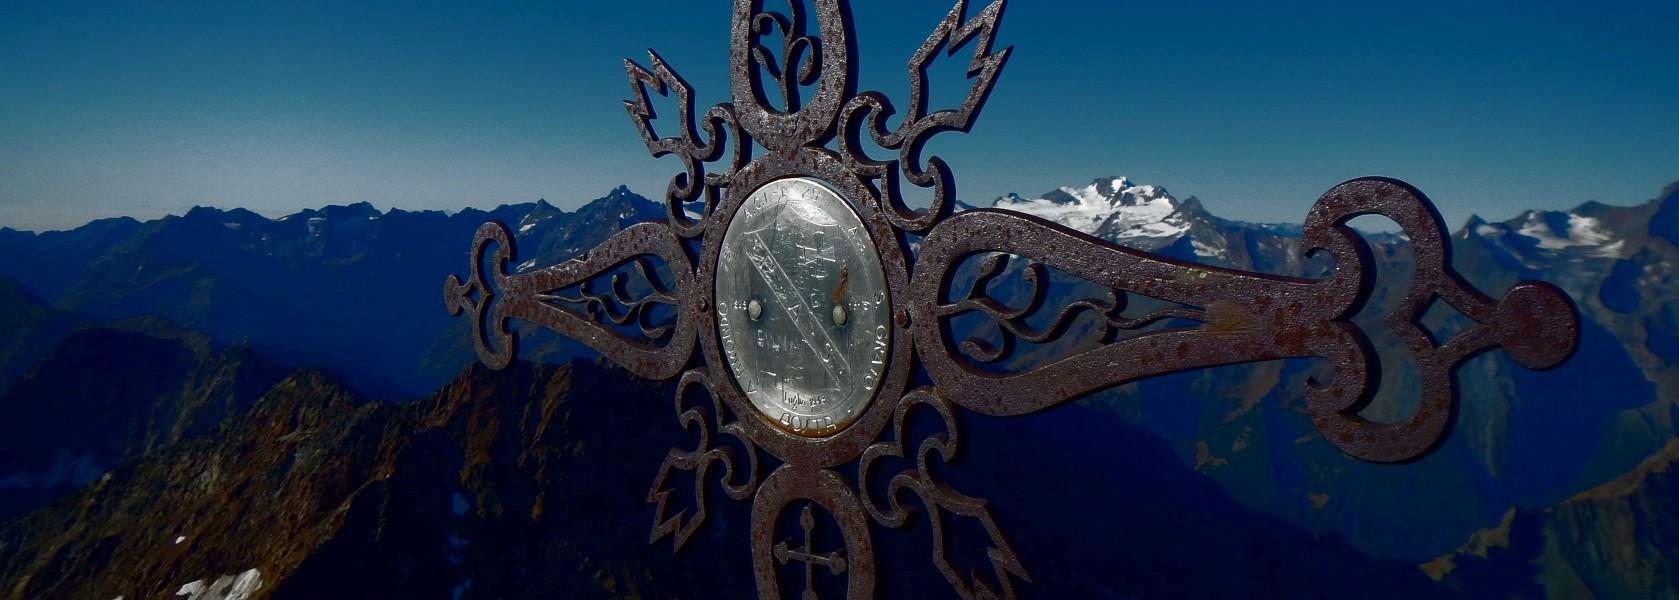 bergwandelen en bergtochten Aosta